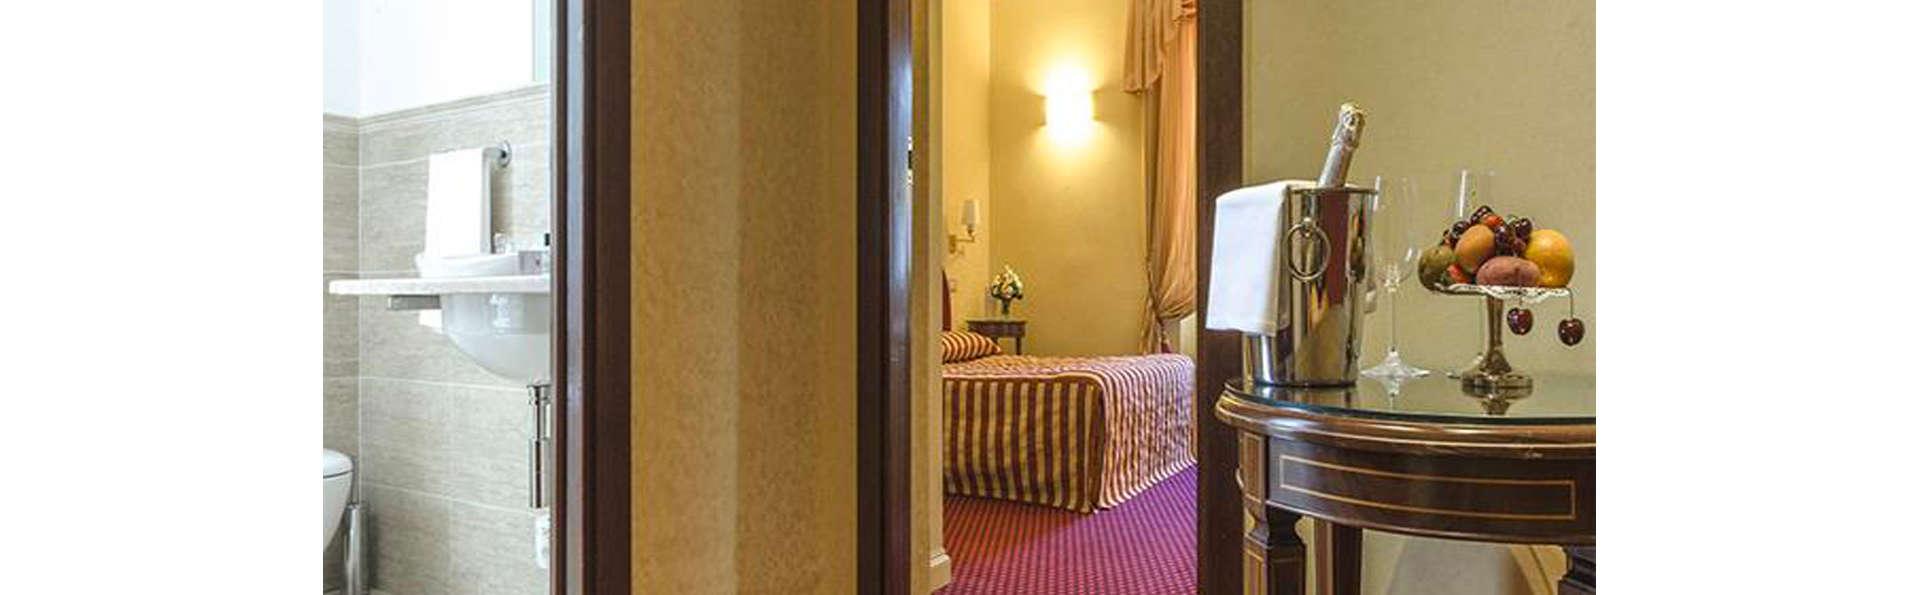 Hotel Firenze E Continentale  - EDIT_ROOM_02.jpg